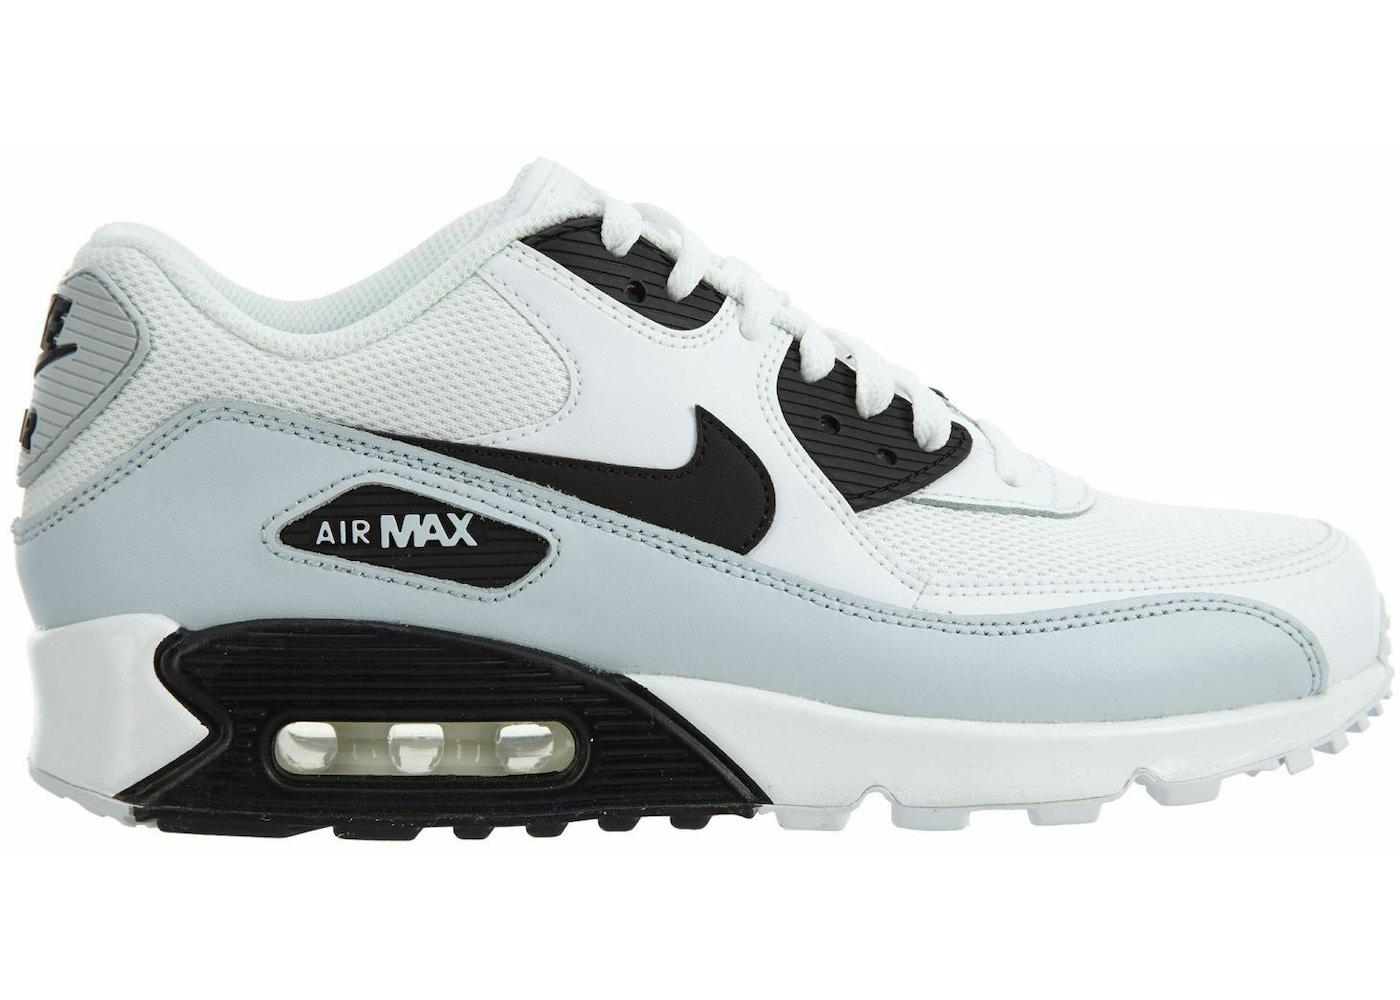 f720c658 Nike Air Max 90 Essential White/Black-Pure Platinum-White - 537384-127